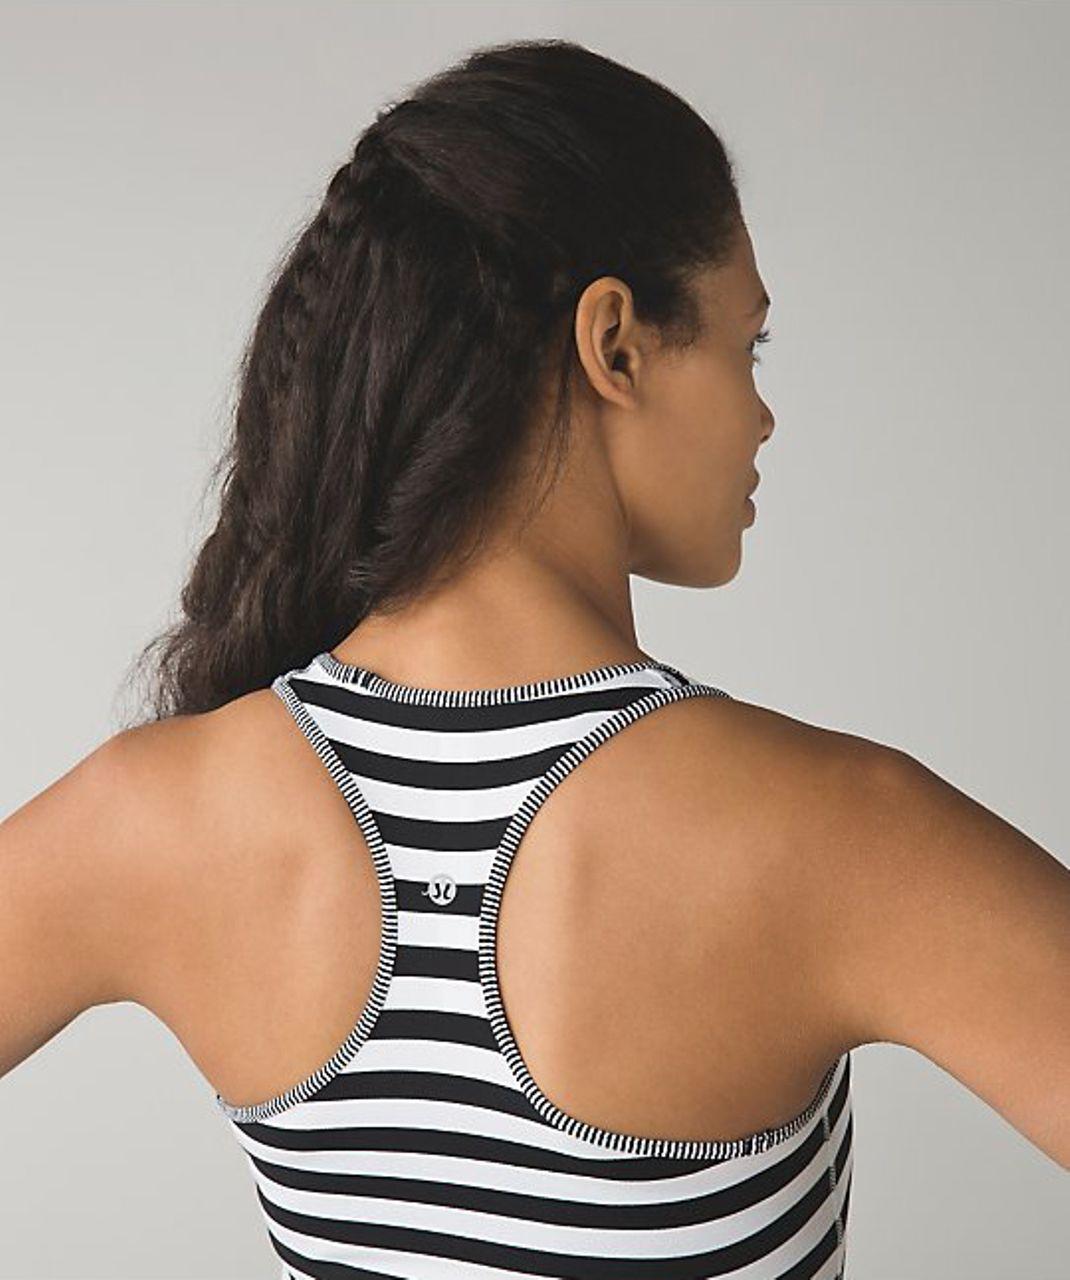 Lululemon Cool Racerback - Apex Stripe Black White